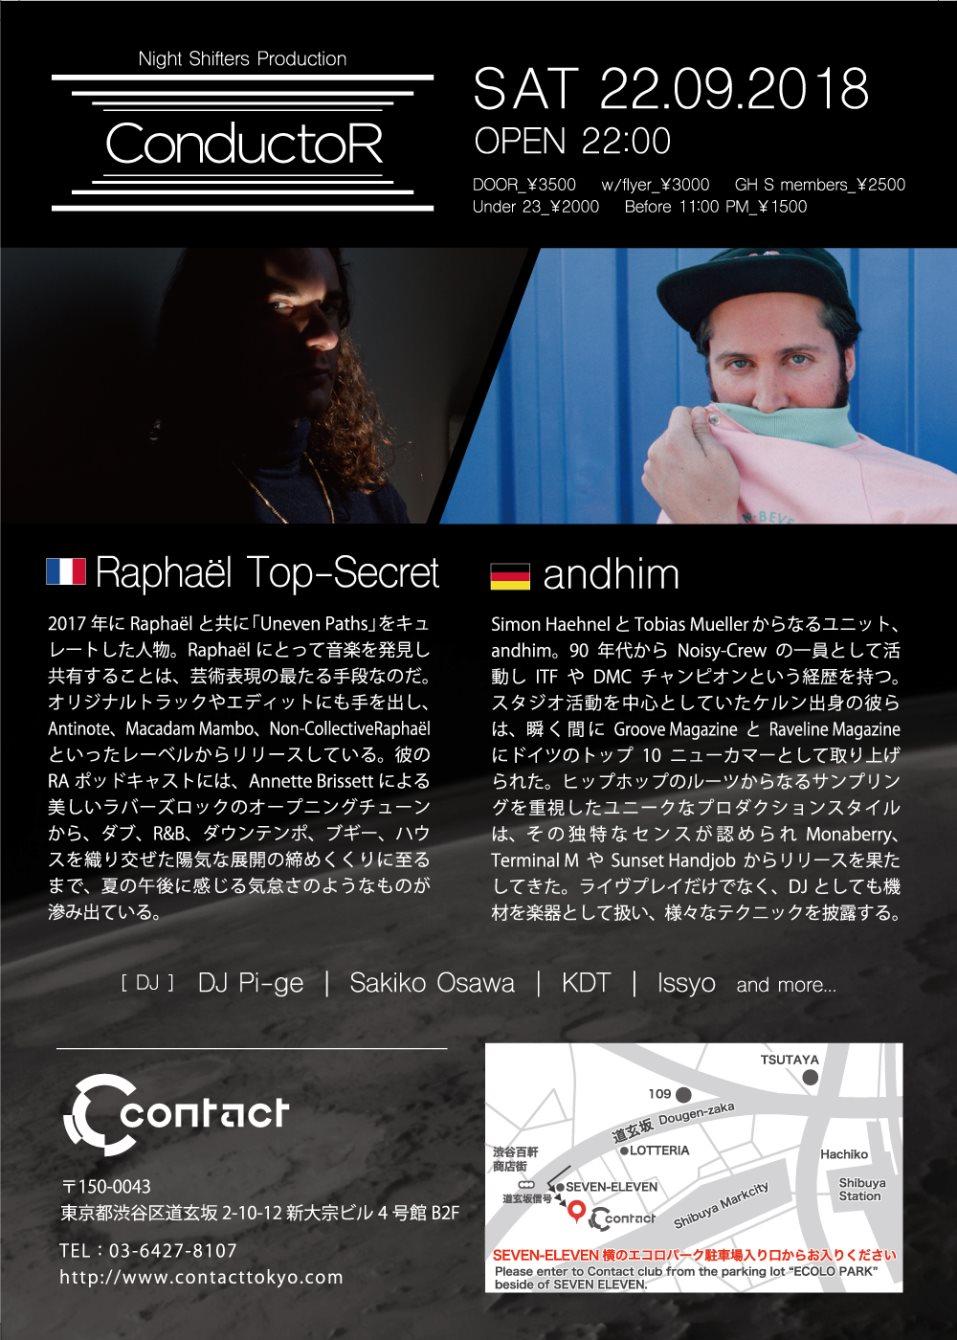 Conductor Feat. Andhim, Raphaël Top-Secret - Flyer back